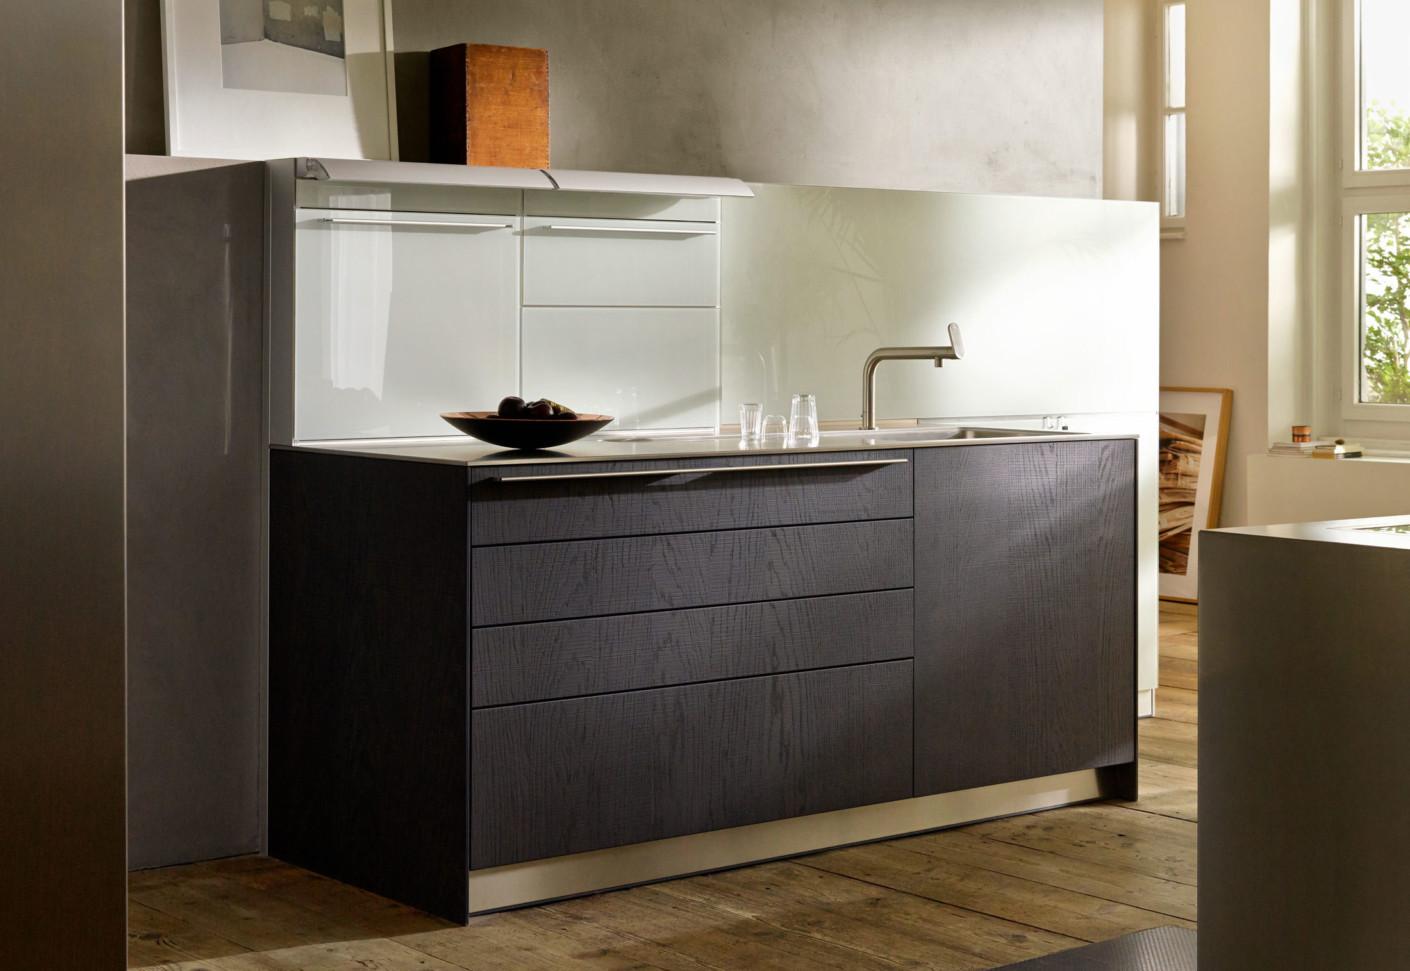 Bulthaup b3 veneer and solid wood by bulthaup stylepark - Bulthaup en ...